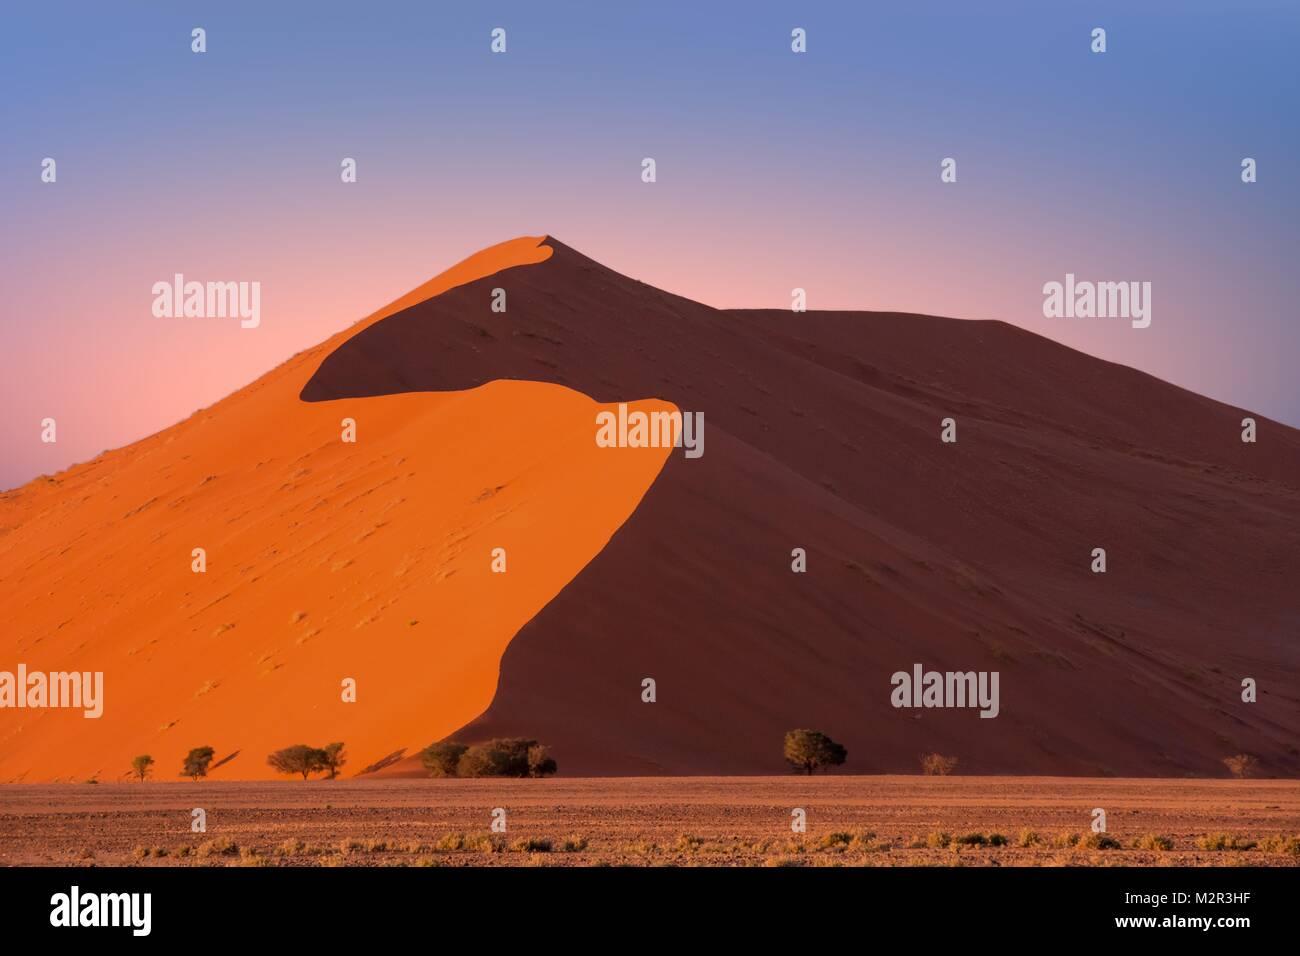 Sand dune 45 in Sossusvlei, Namibia Stock Photo